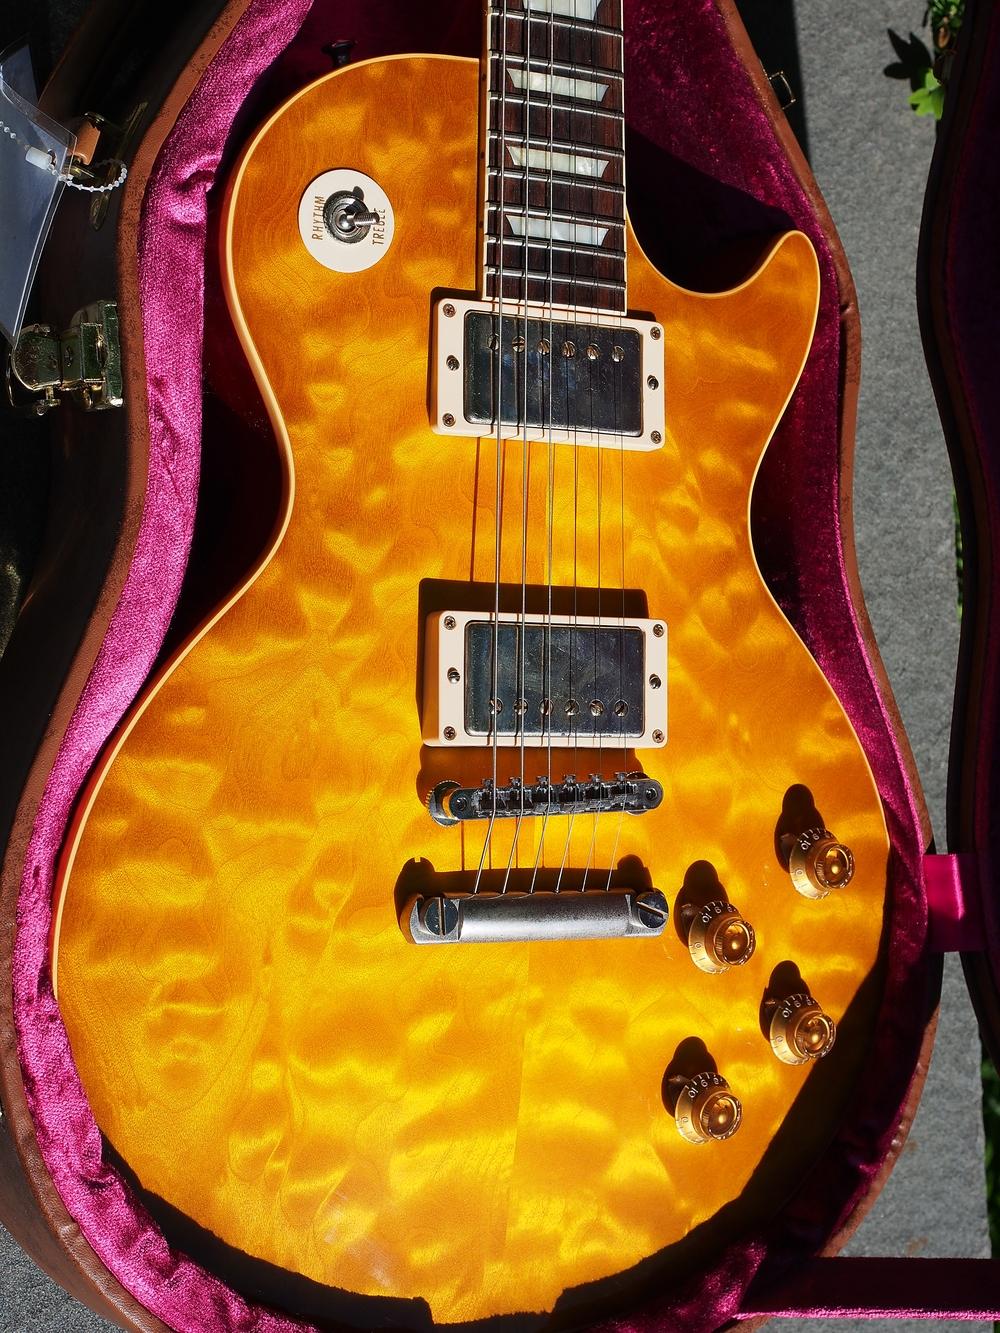 2013 Gibson Custom Shop Les Paul 1959 R9 Standard in Lemon Quilt - Available